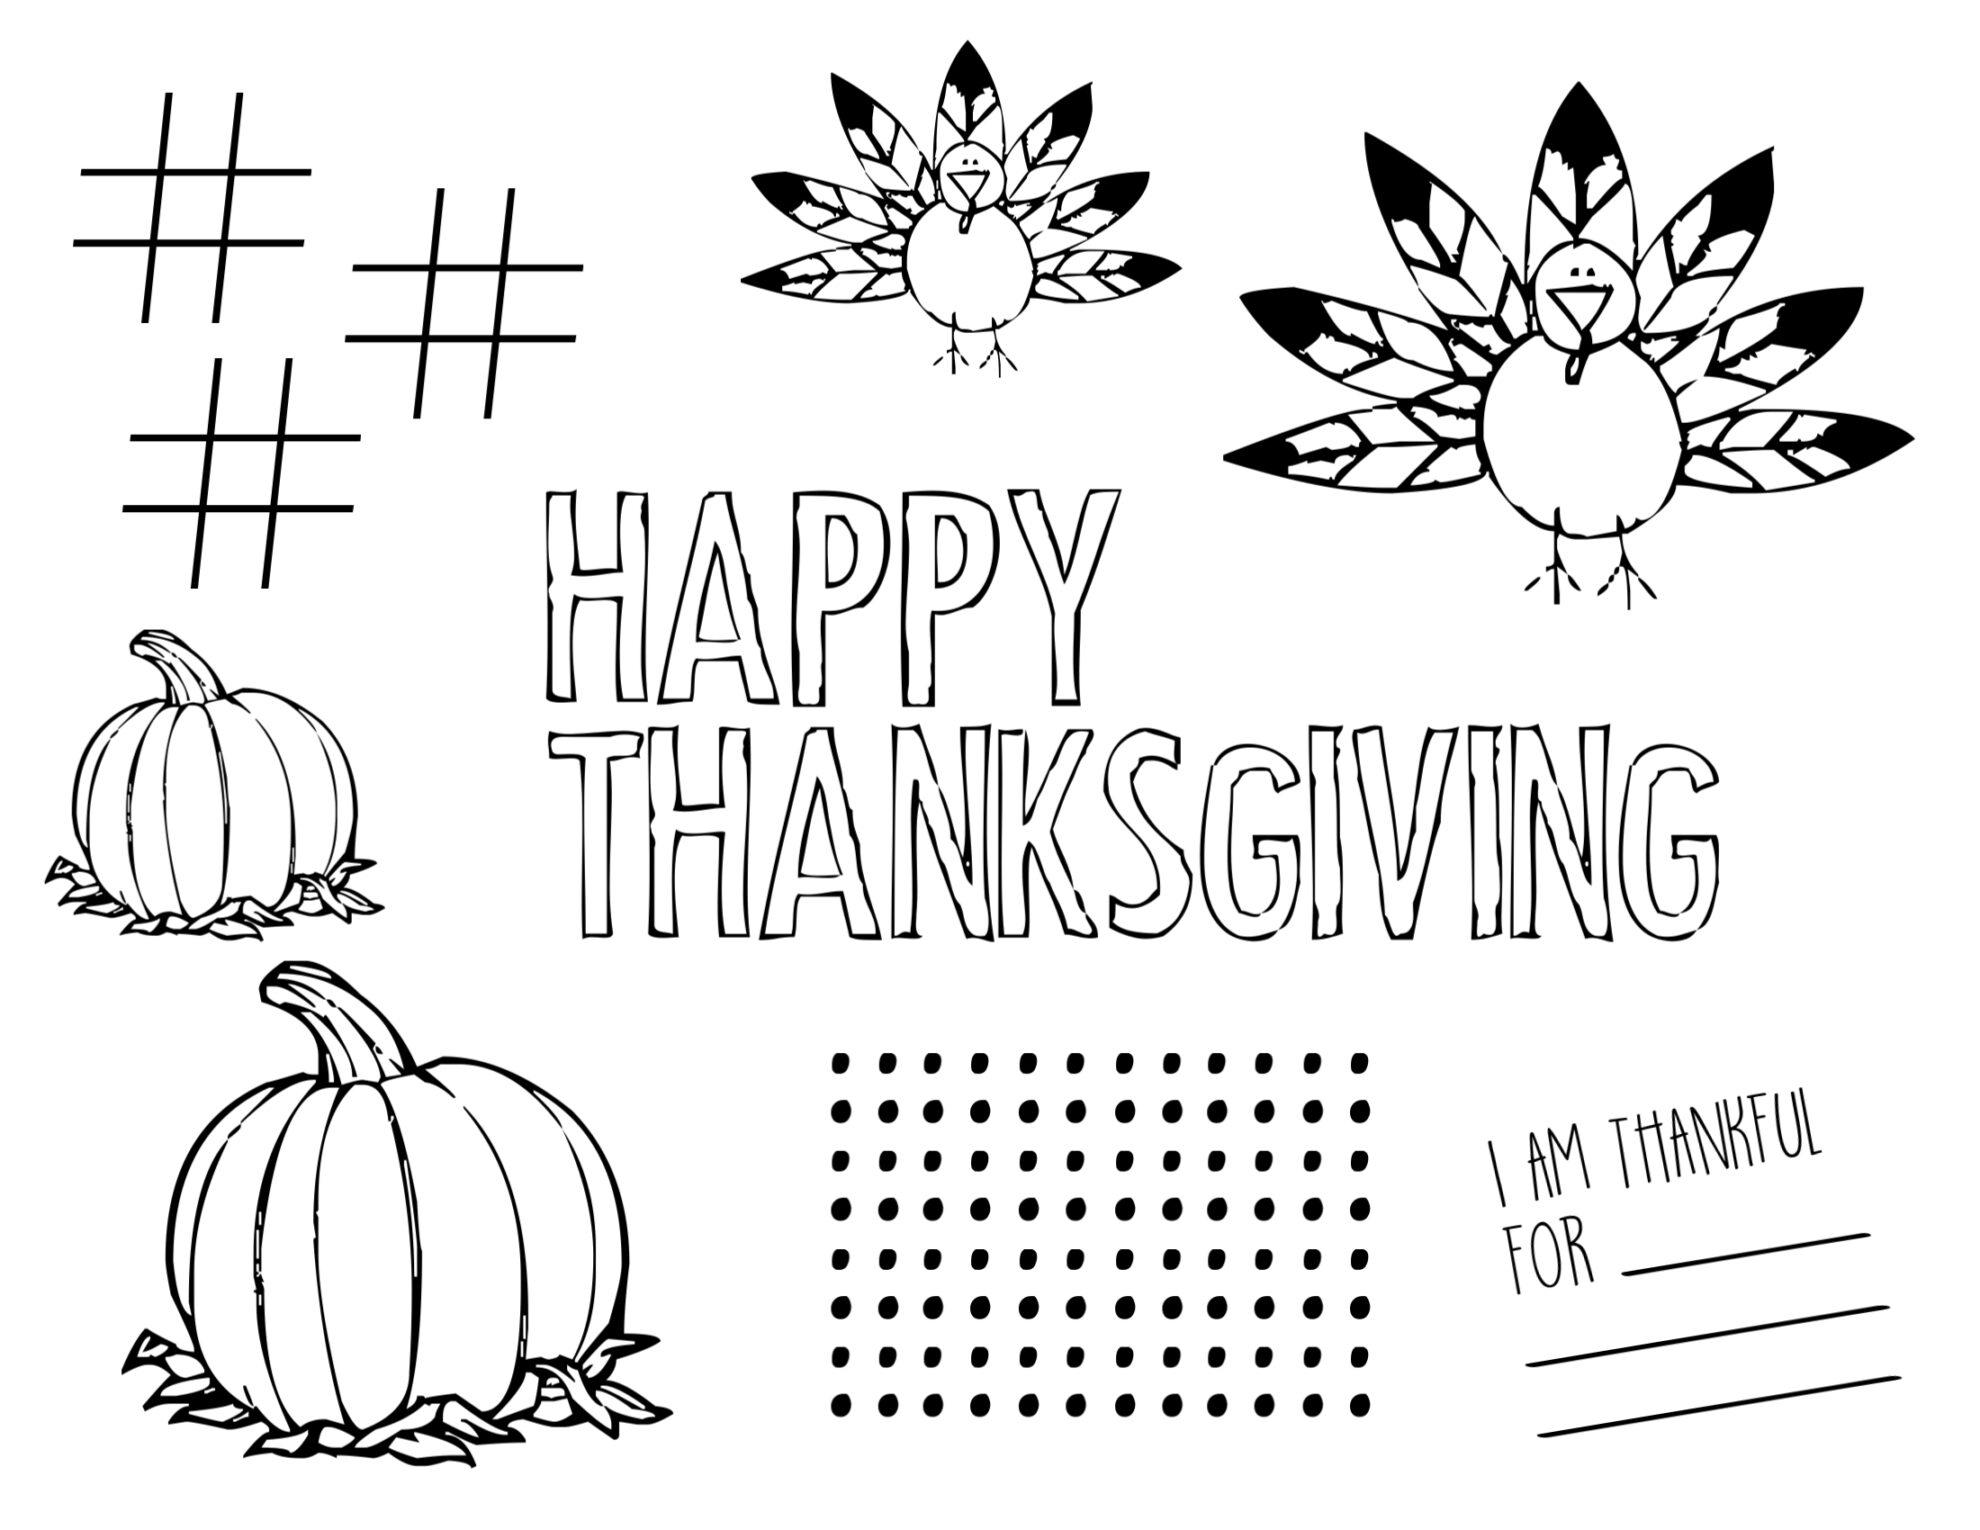 Free printable thanksgiving placemat paper trail design regular kids thanksgiving placemat free printable maxwellsz